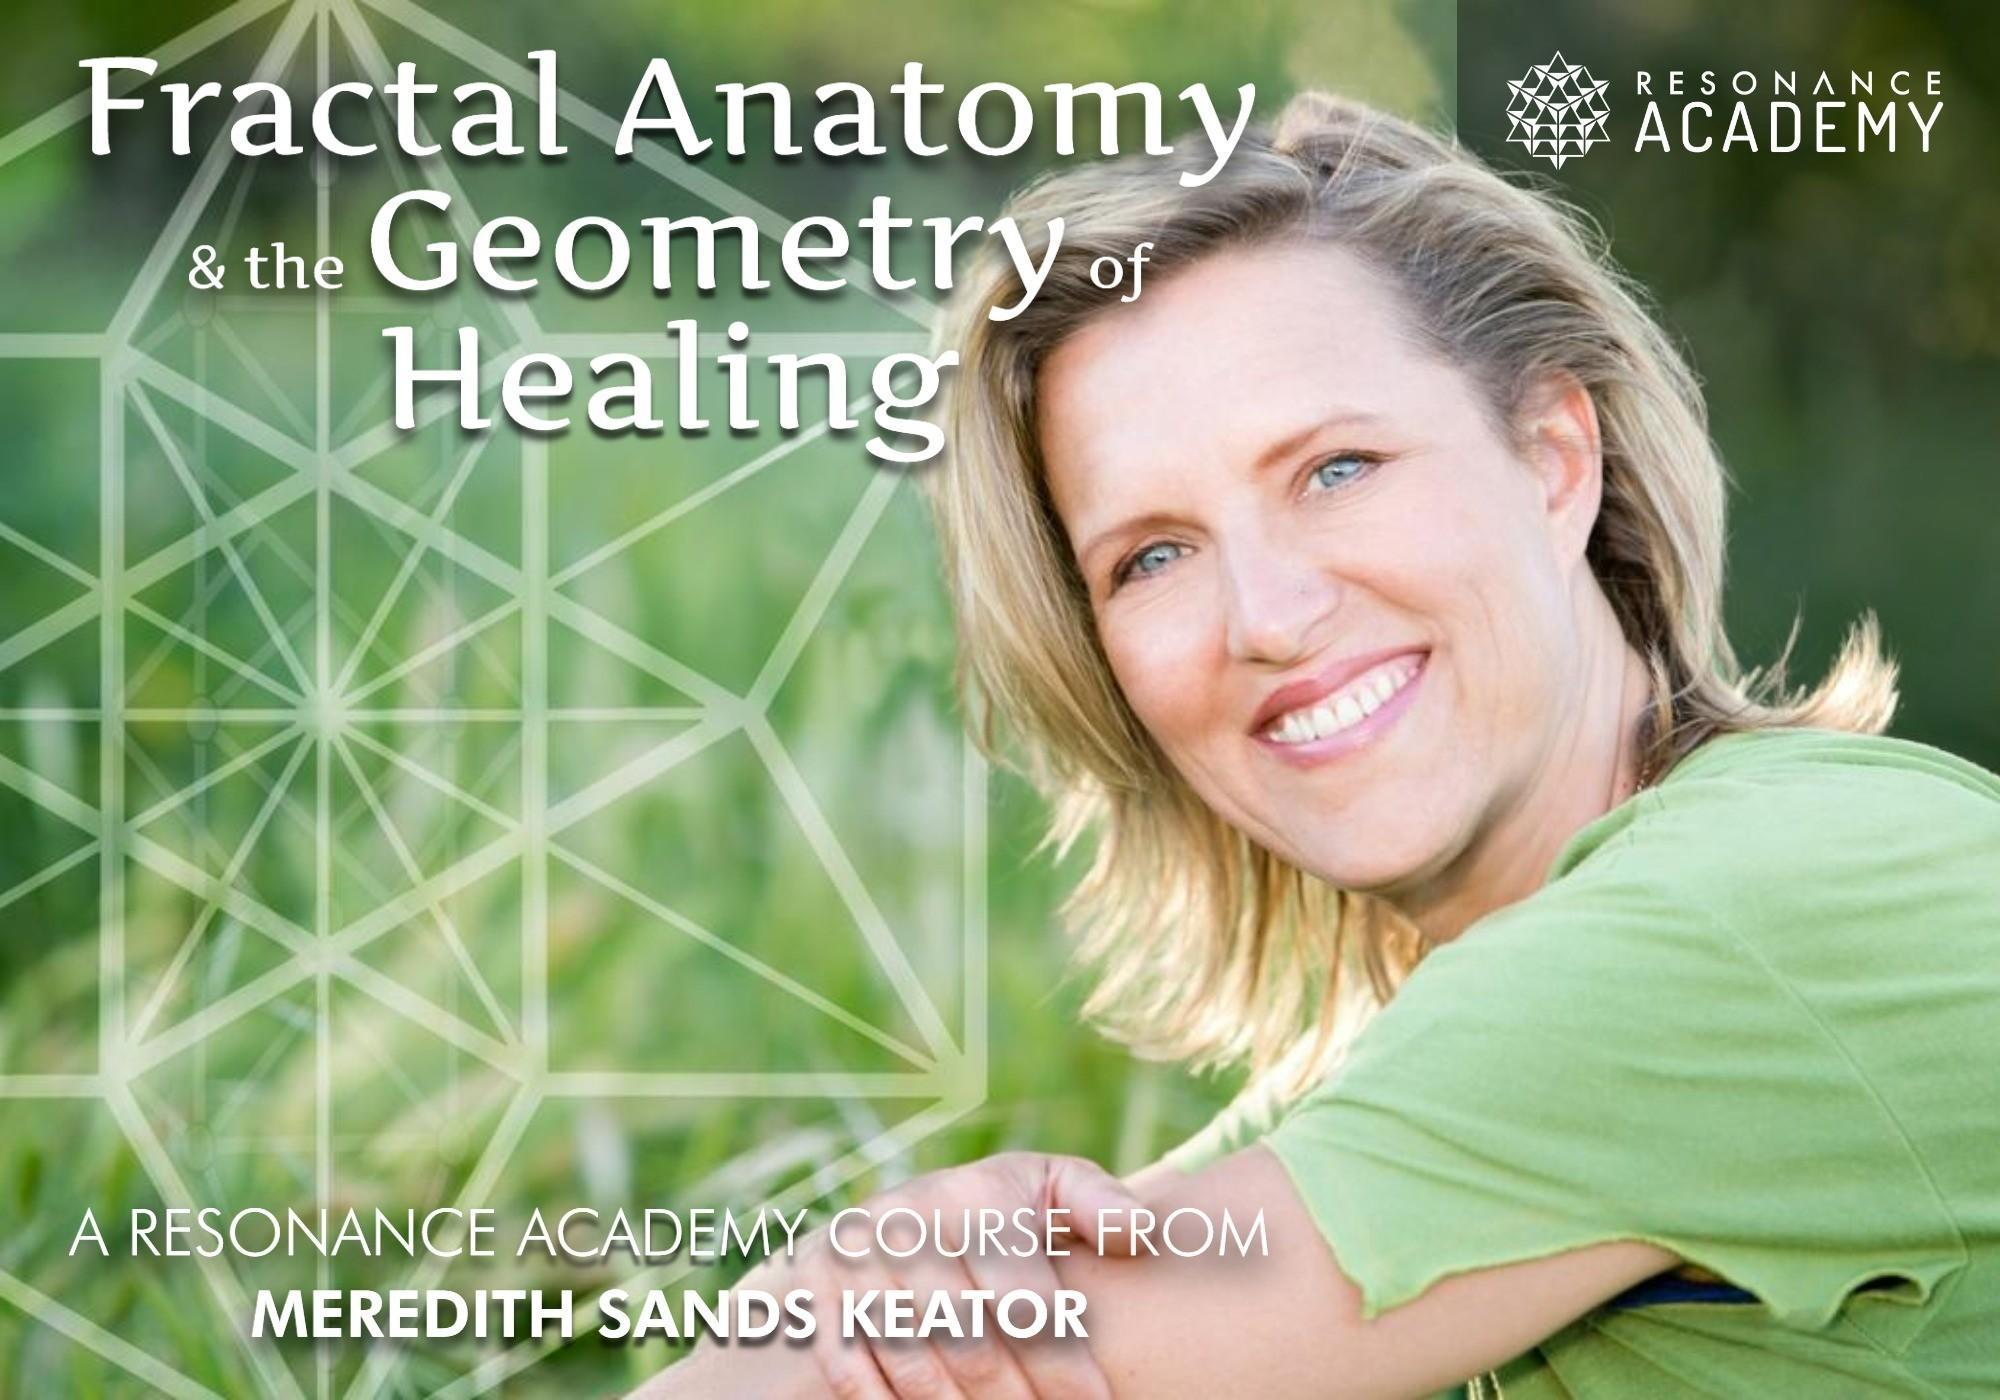 Fractal Anatomy & The Geometry of Healing - Meredith Sands Keator